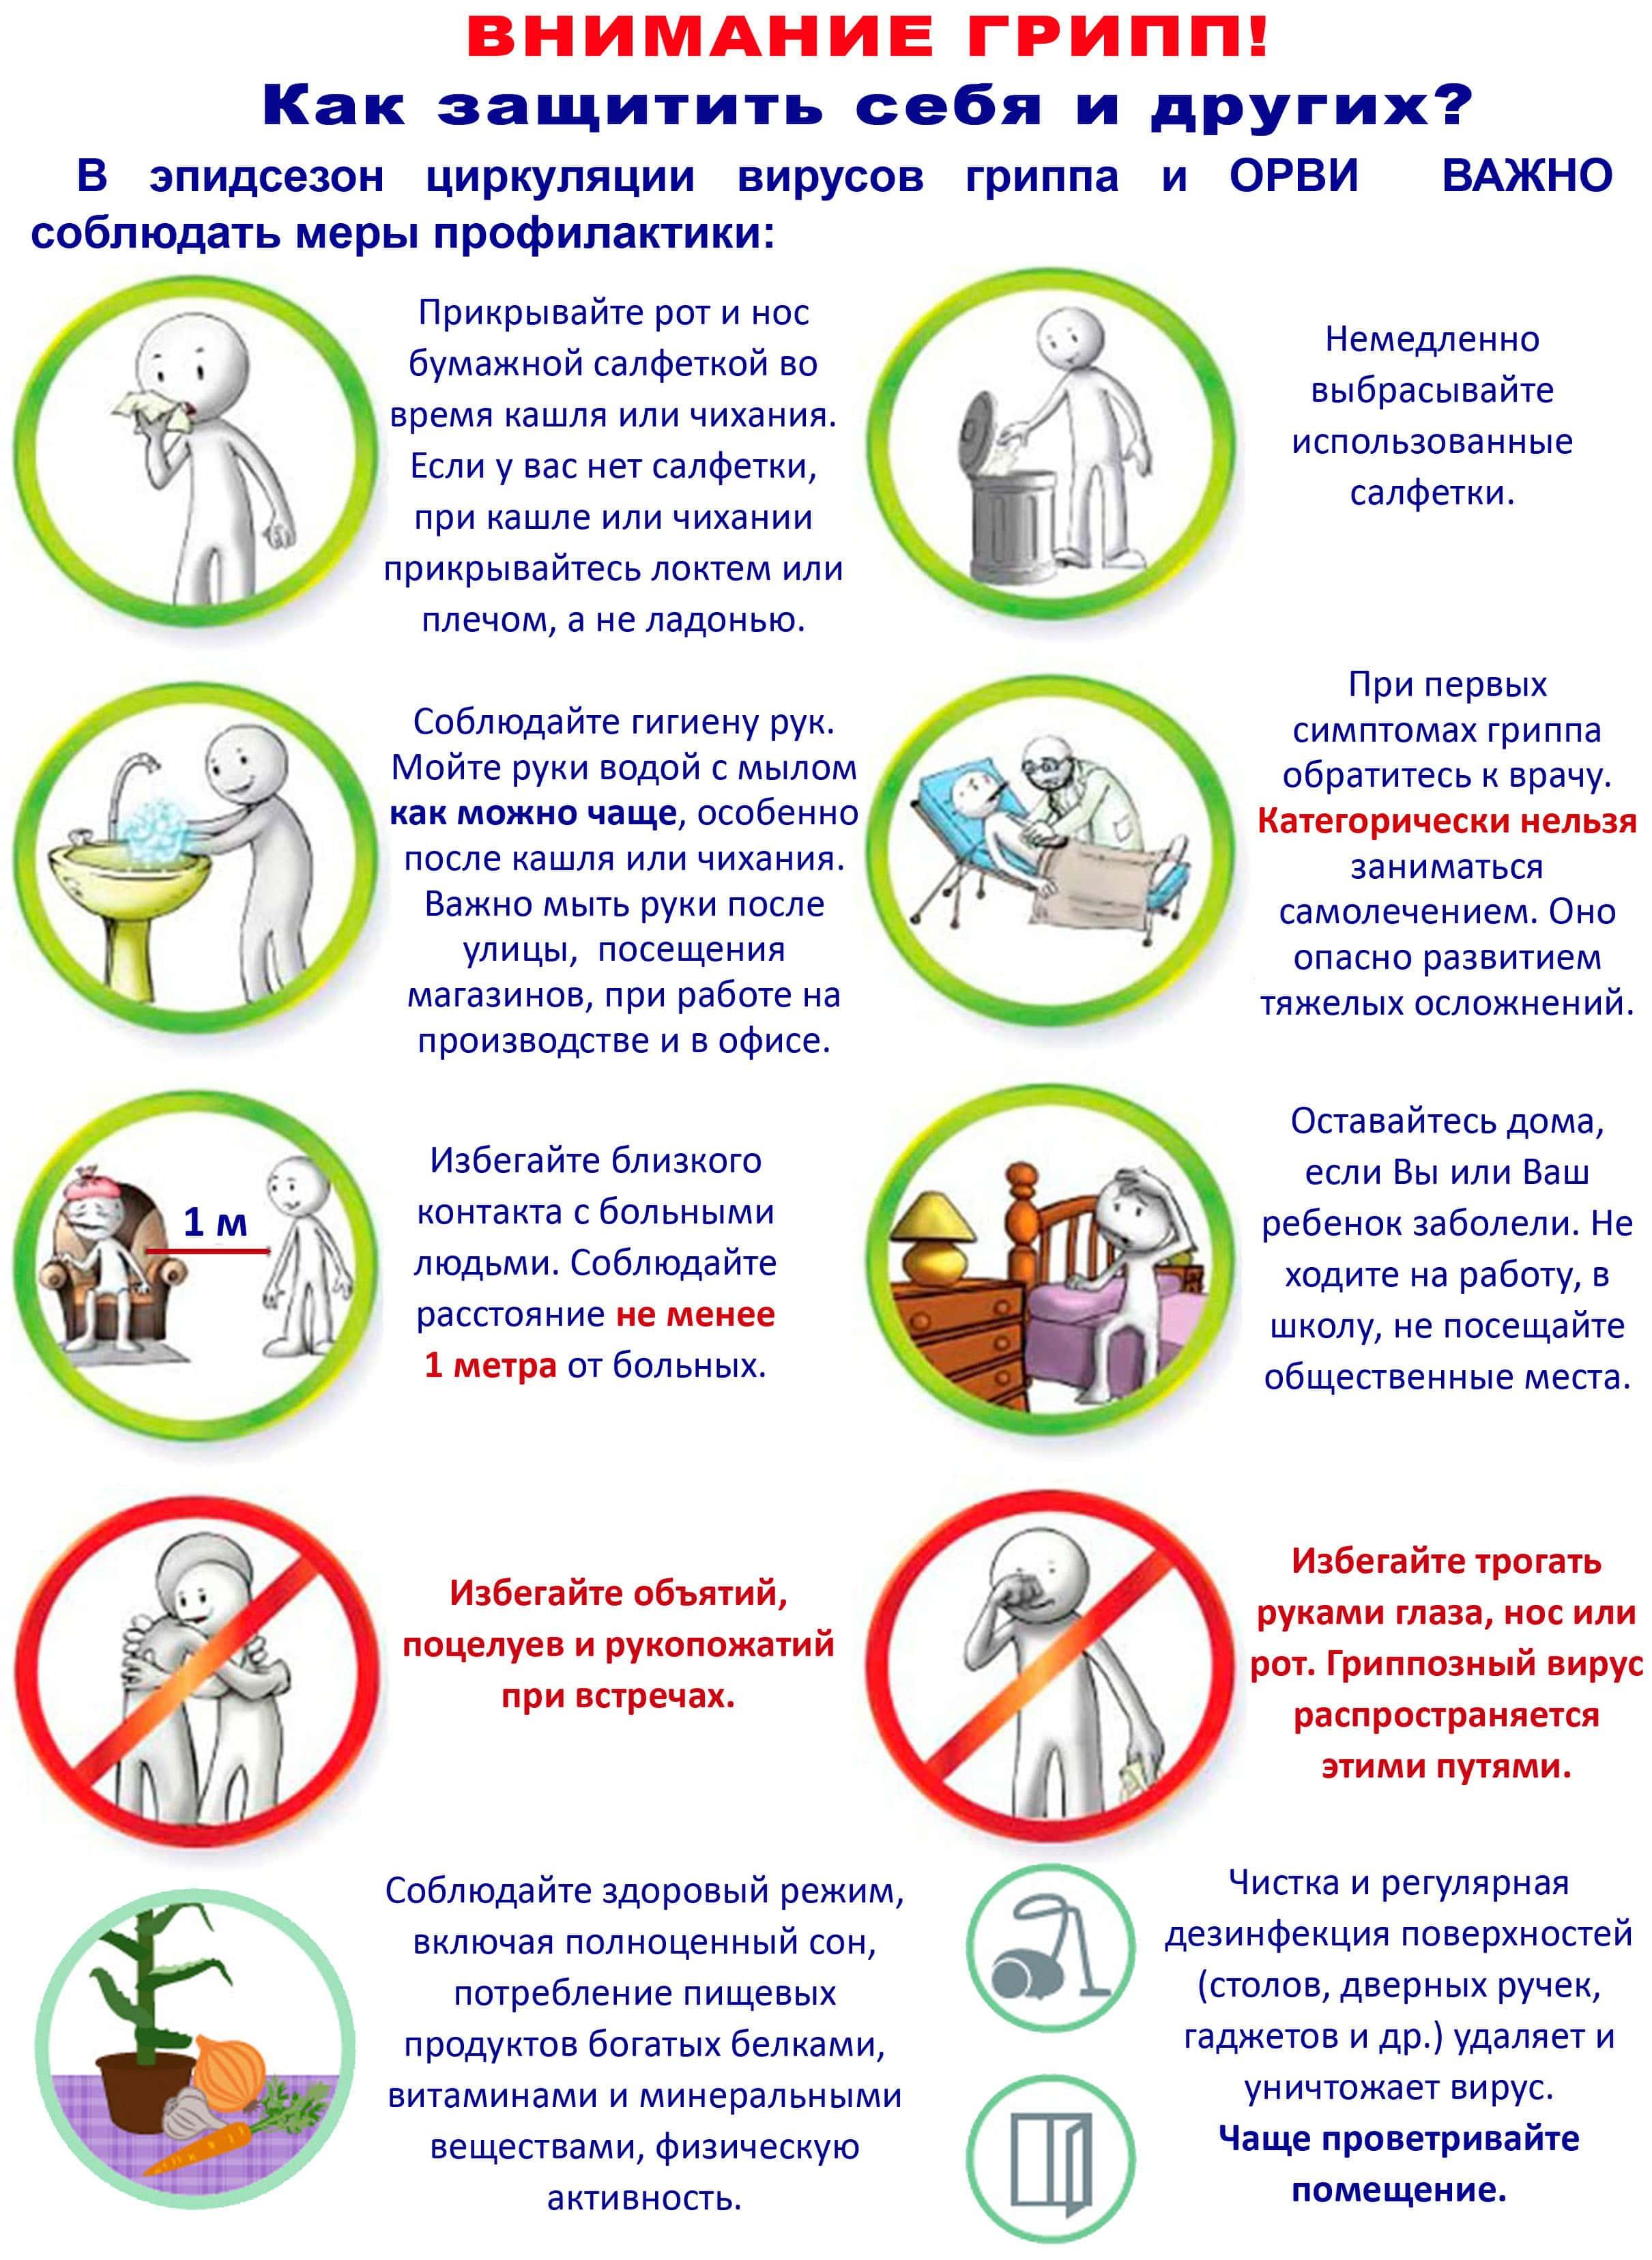 Vnimanie-gripp-Interesnyie-faktyi-o-prostude